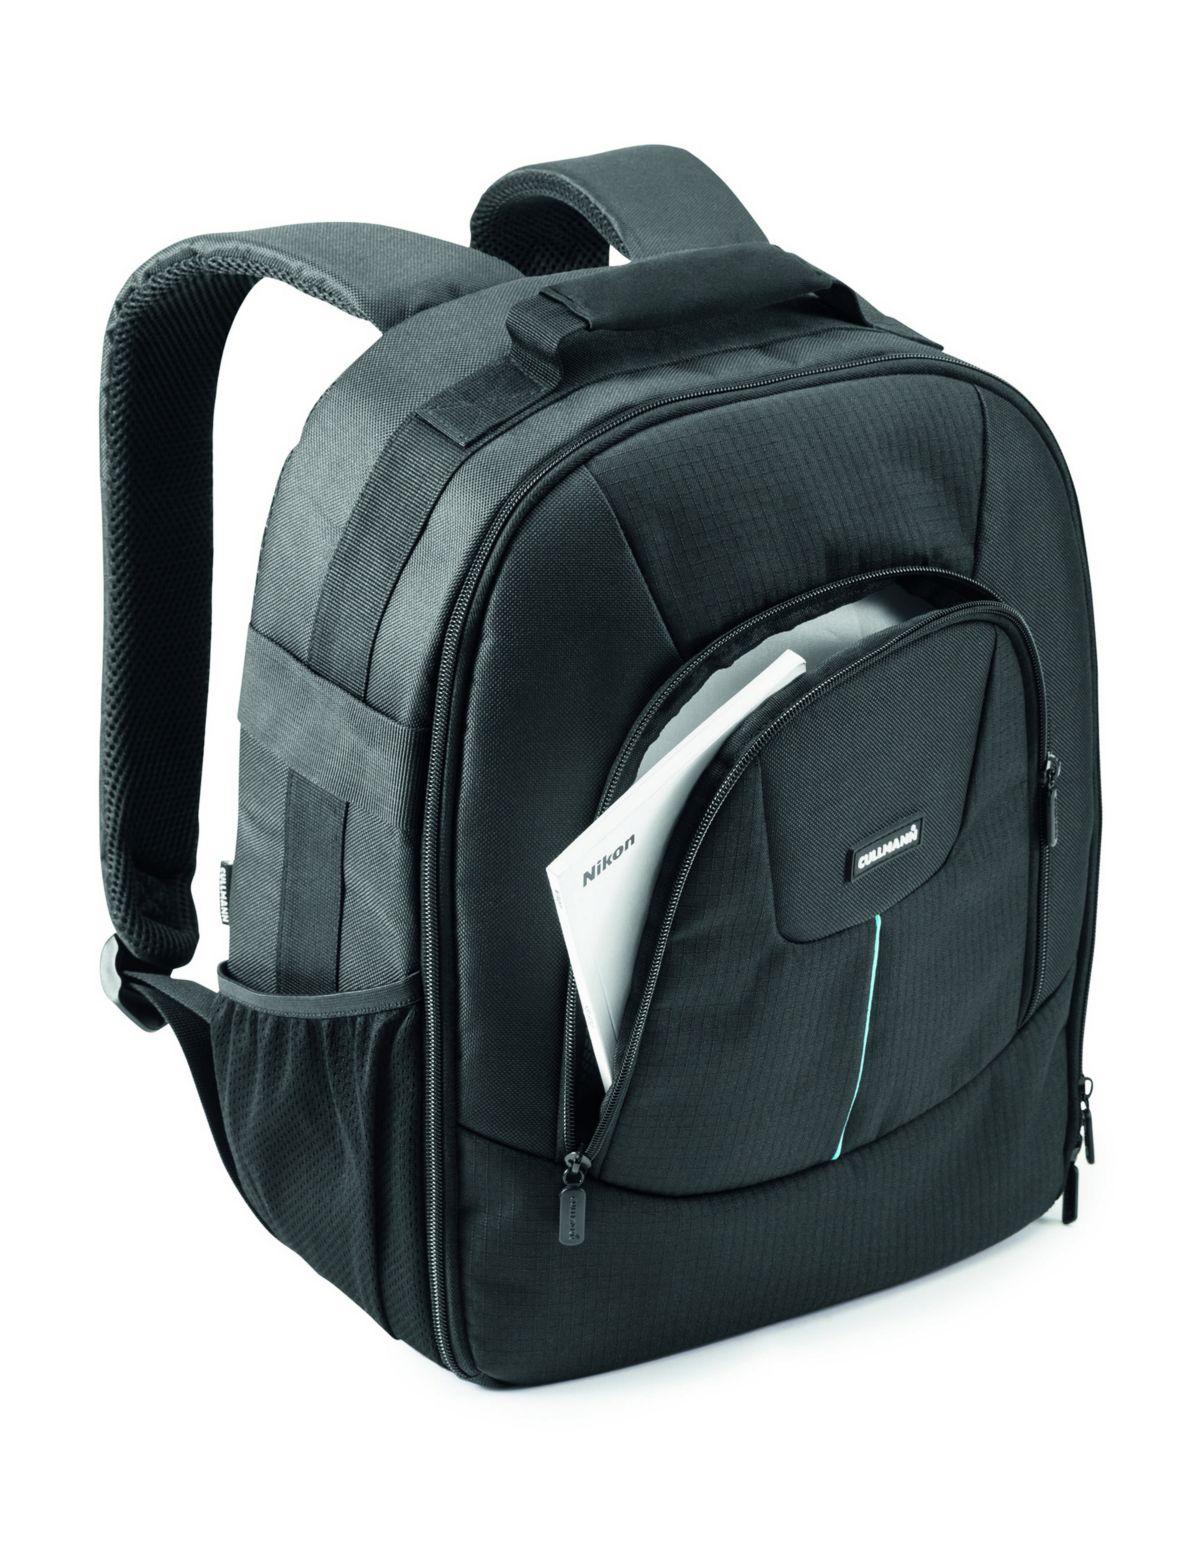 184e727f6e28f Cullmann Kamera-Rucksack für mittelgroße DSLR-Ausrüstung »PANAMA BackPack  400«